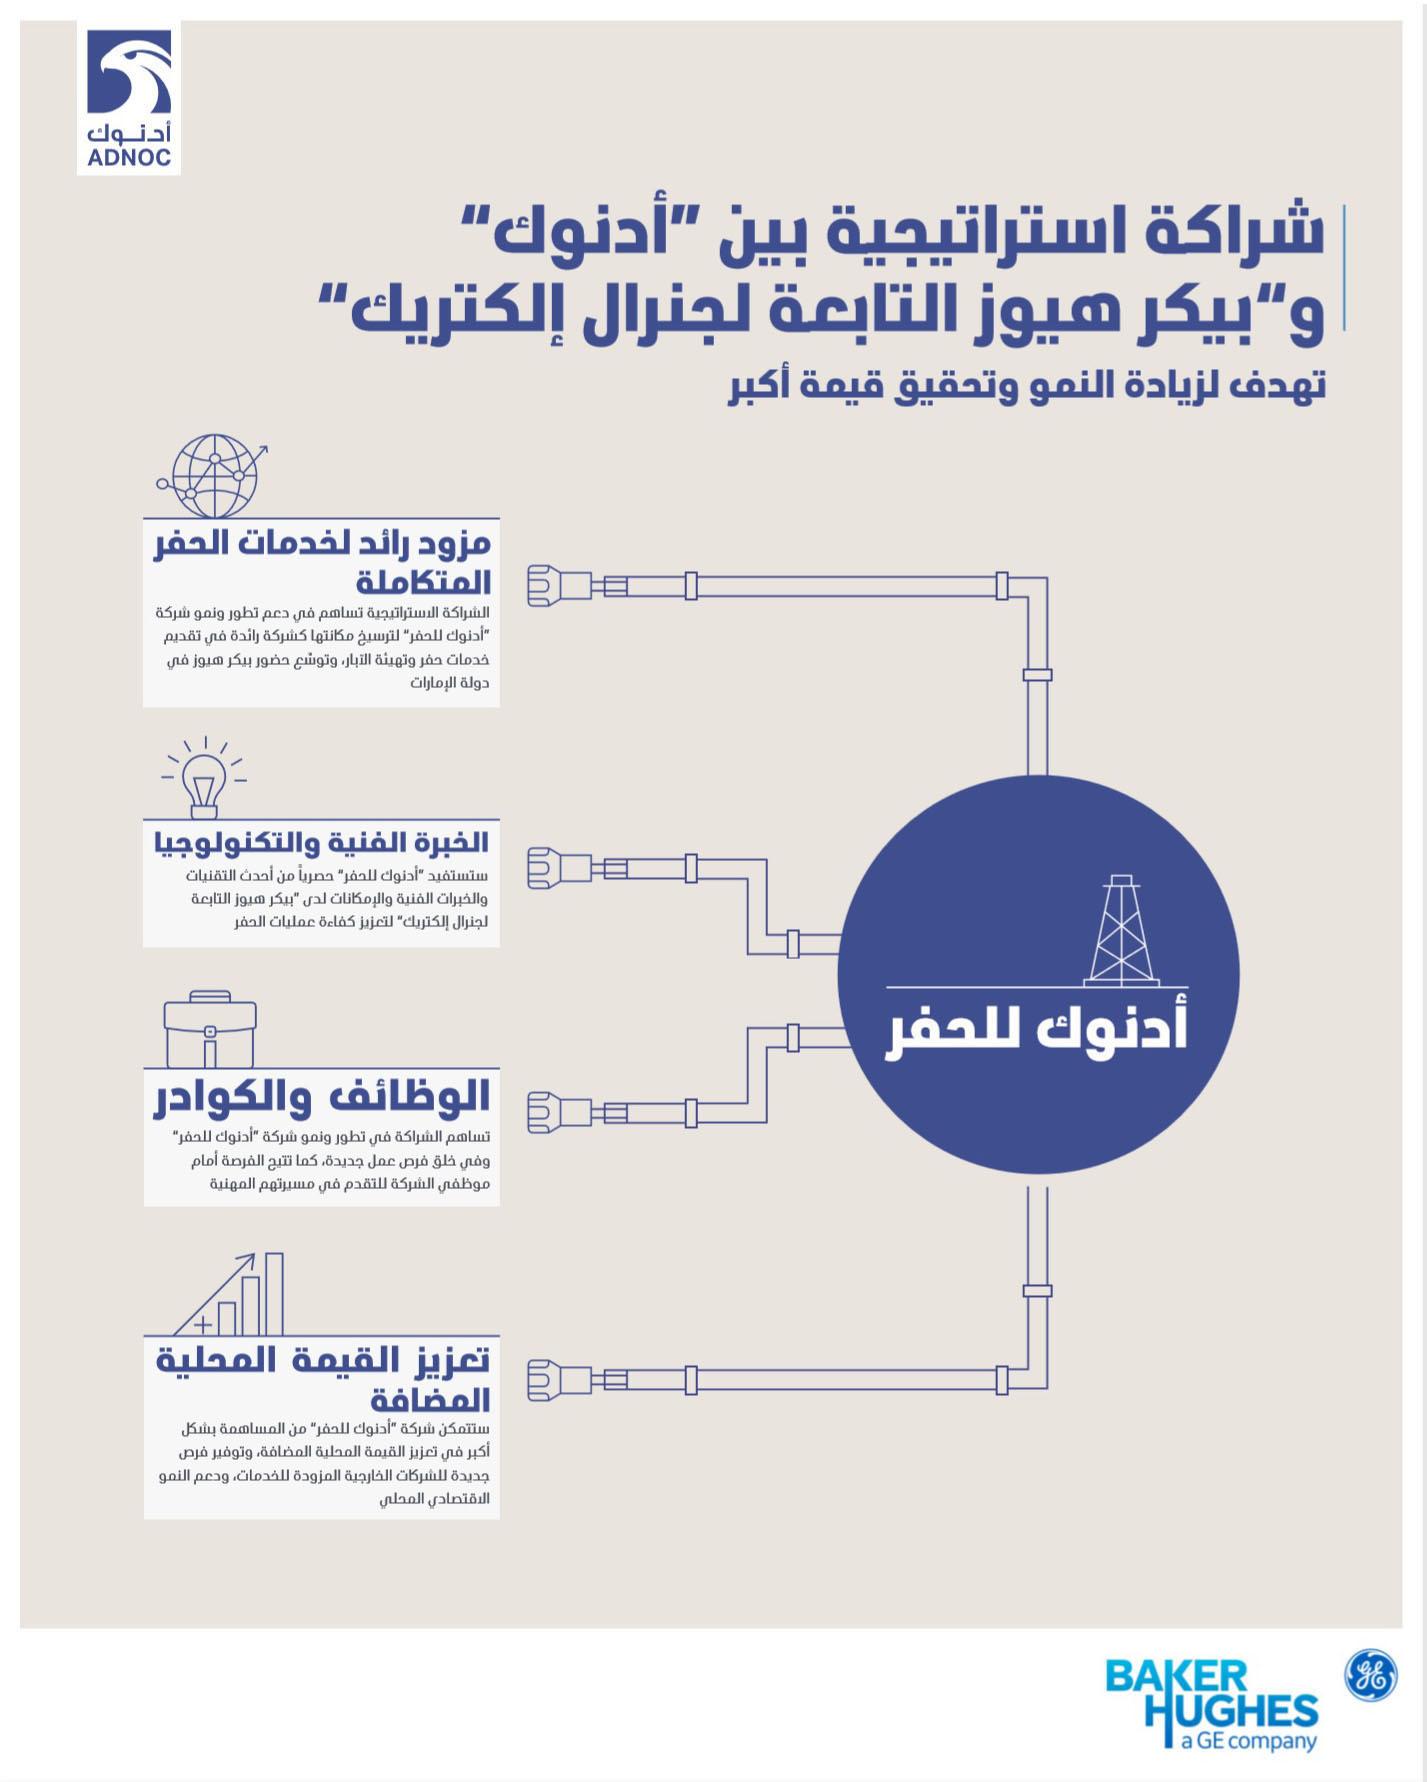 Emirates News Agency - ADNOC, BHGE form strategic